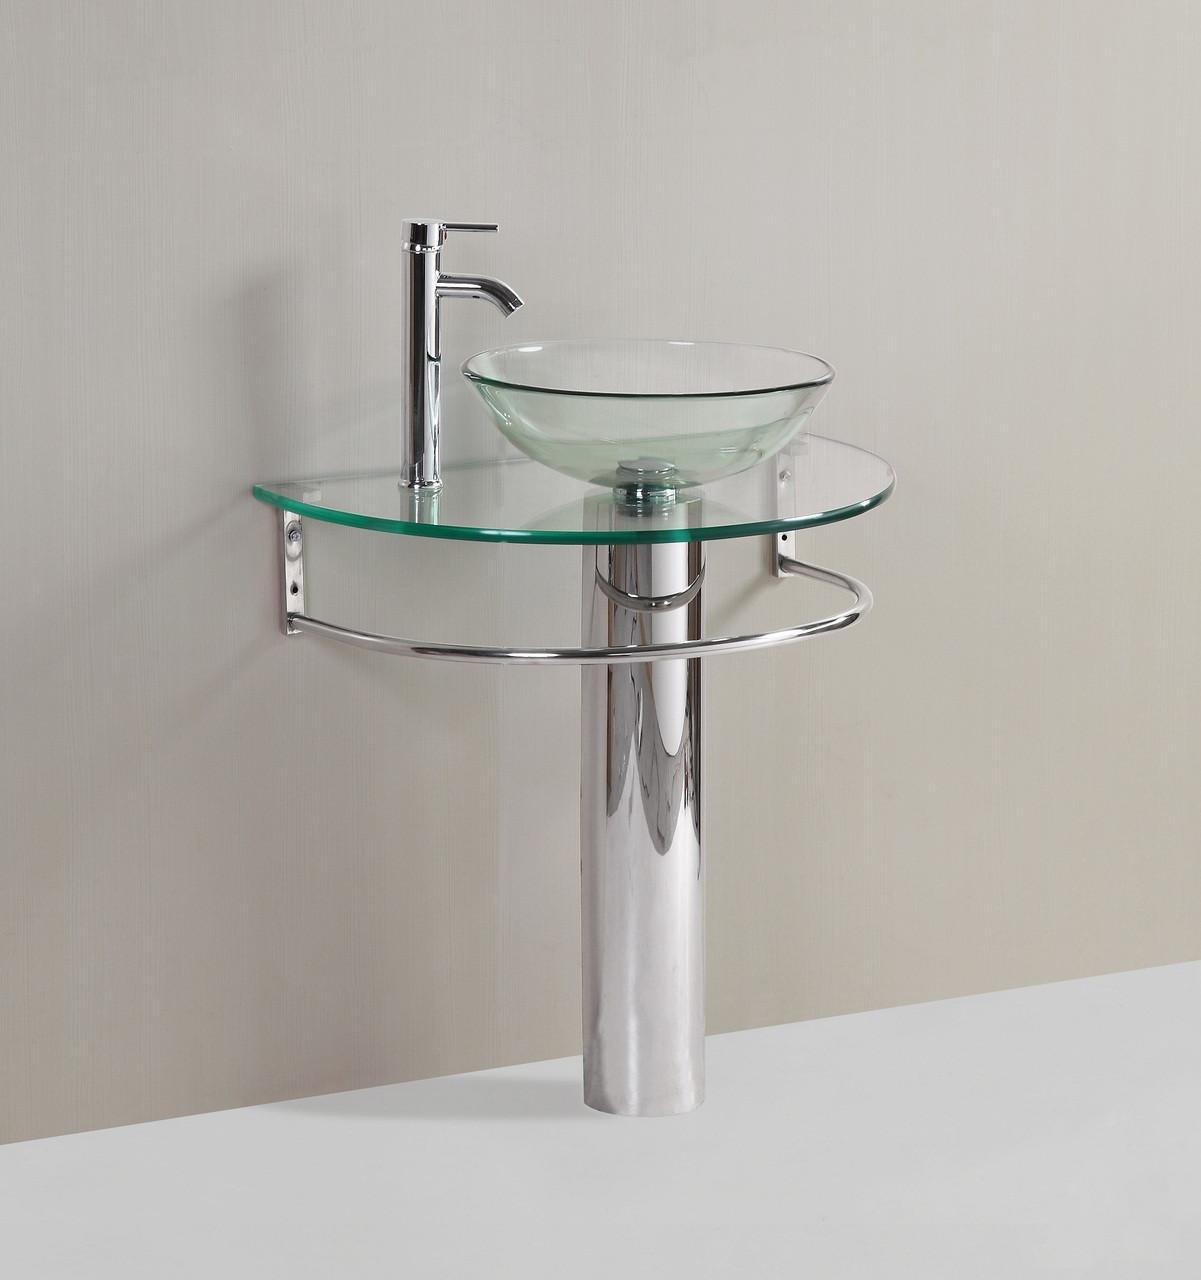 Modern Glass Bathroom Vanity Pedestal Clear Glass Vessel Sink Faucet